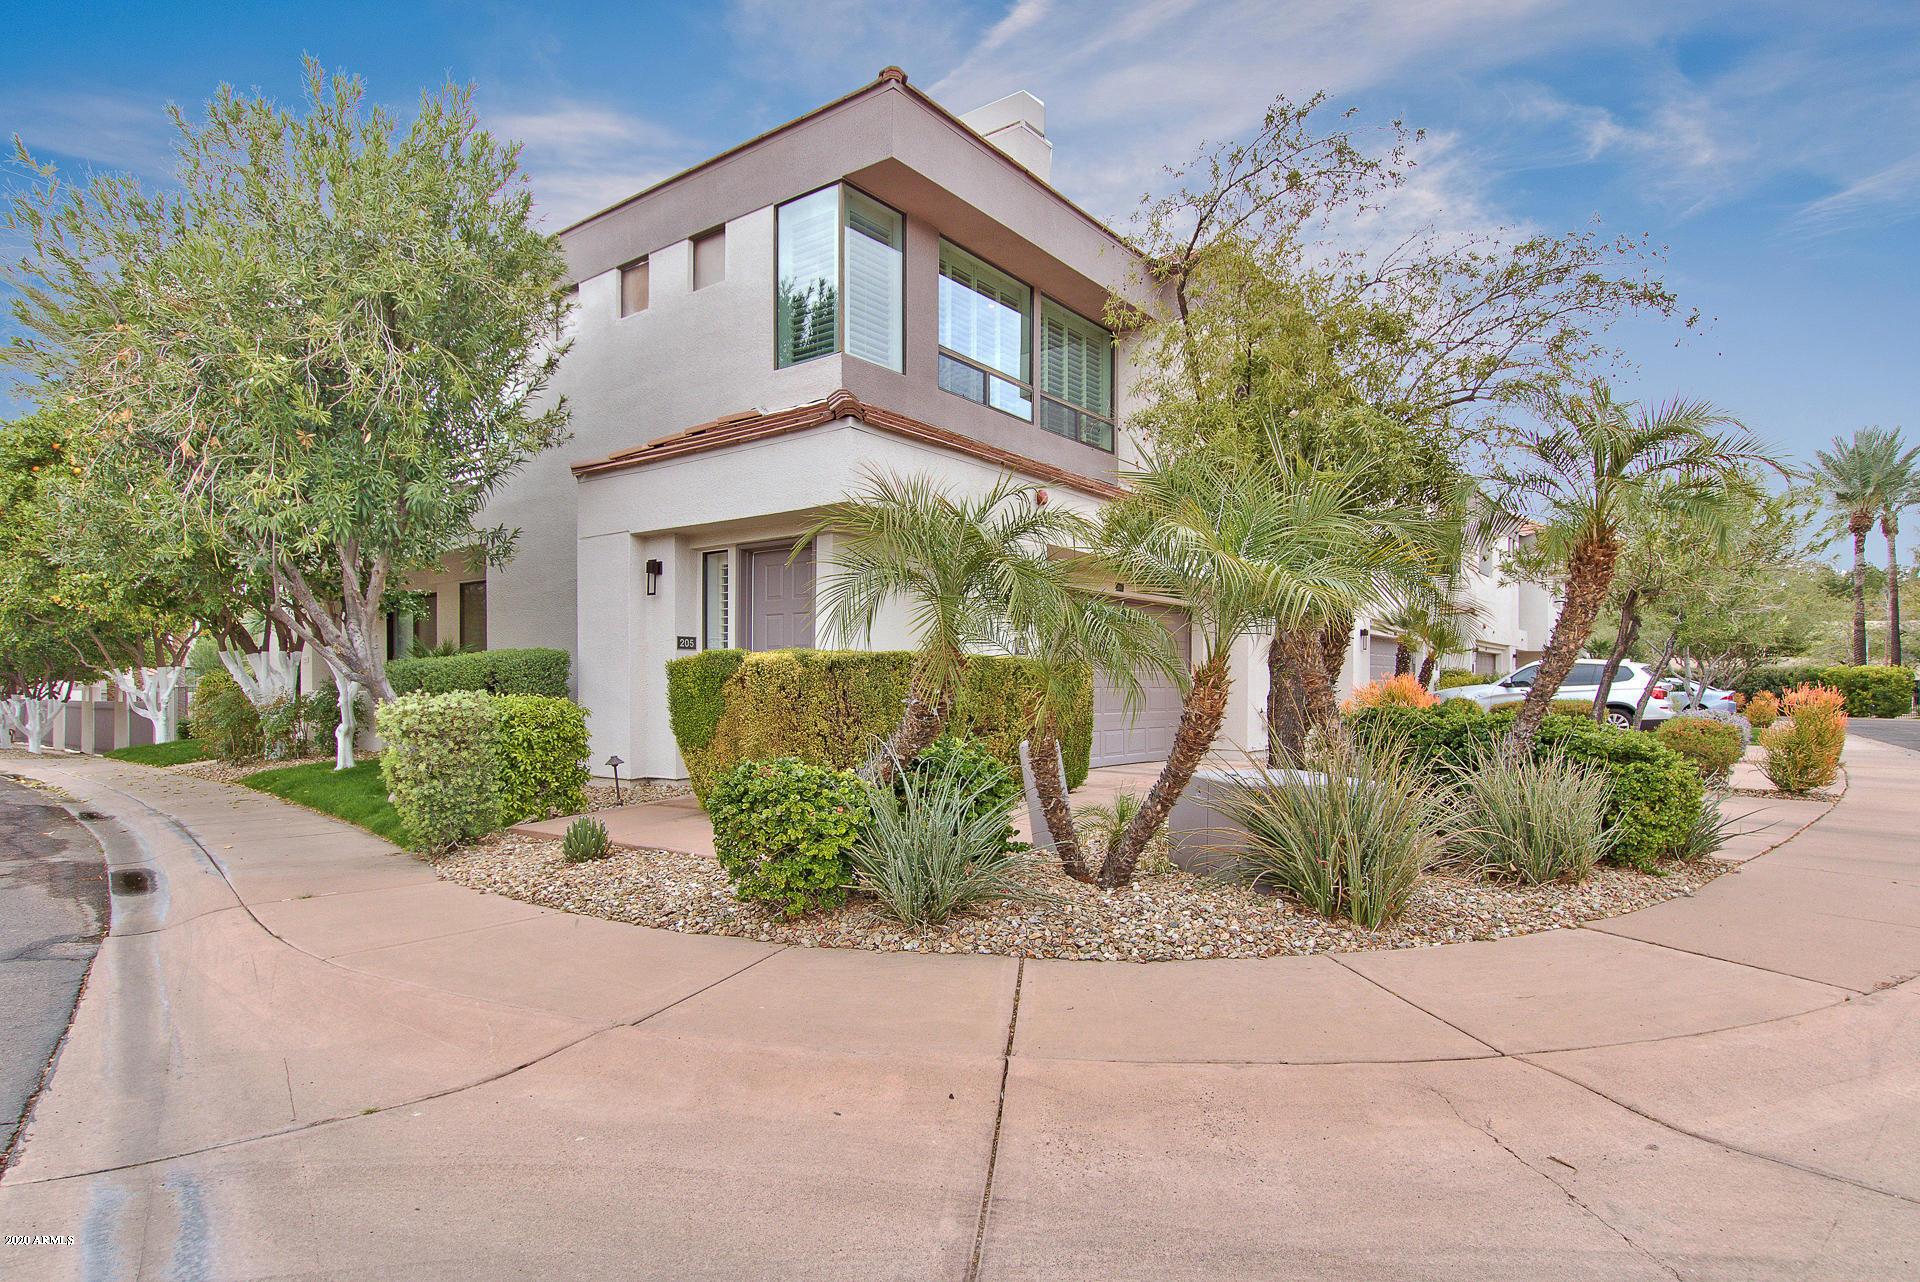 Photo of 7222 E GAINEY RANCH Road #205, Scottsdale, AZ 85258